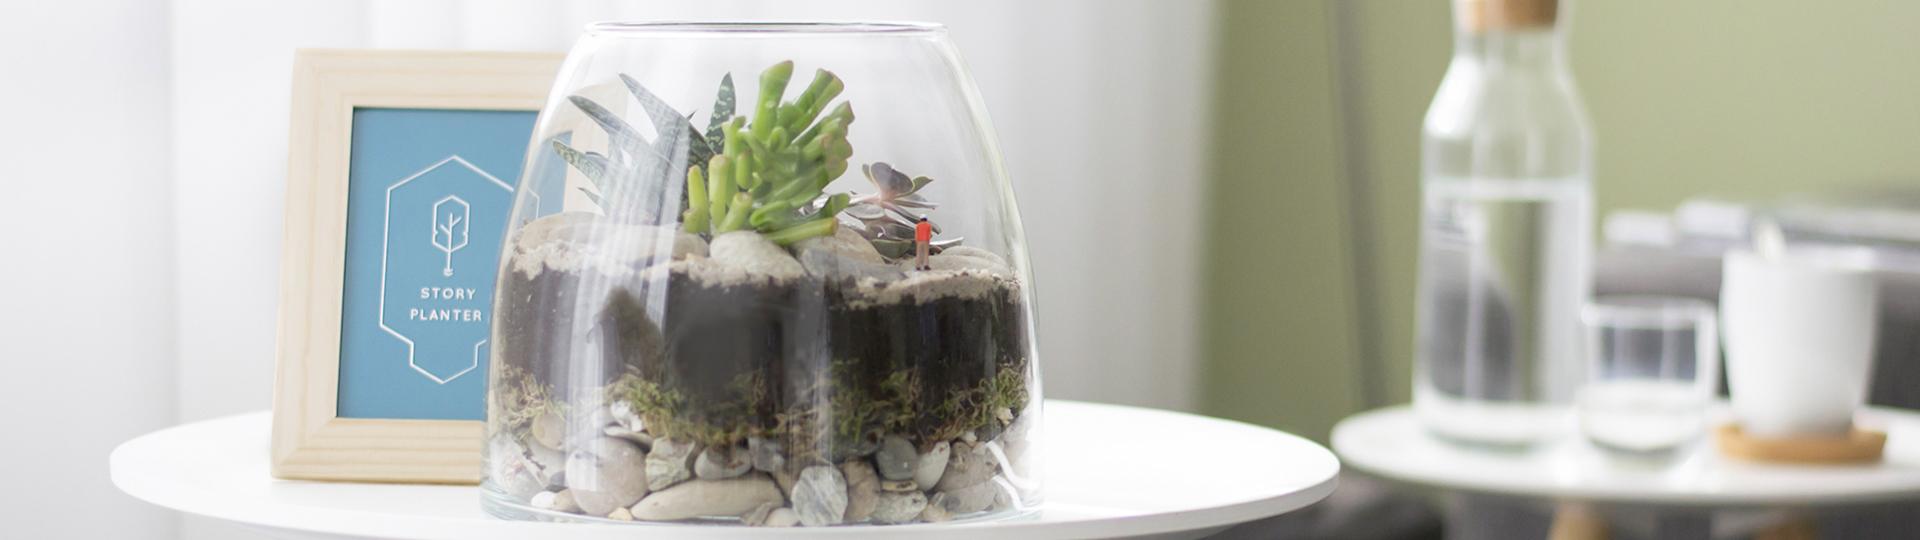 mini, ecosysteem, storyplanter, mini wereld, glazen pot, plantjes,